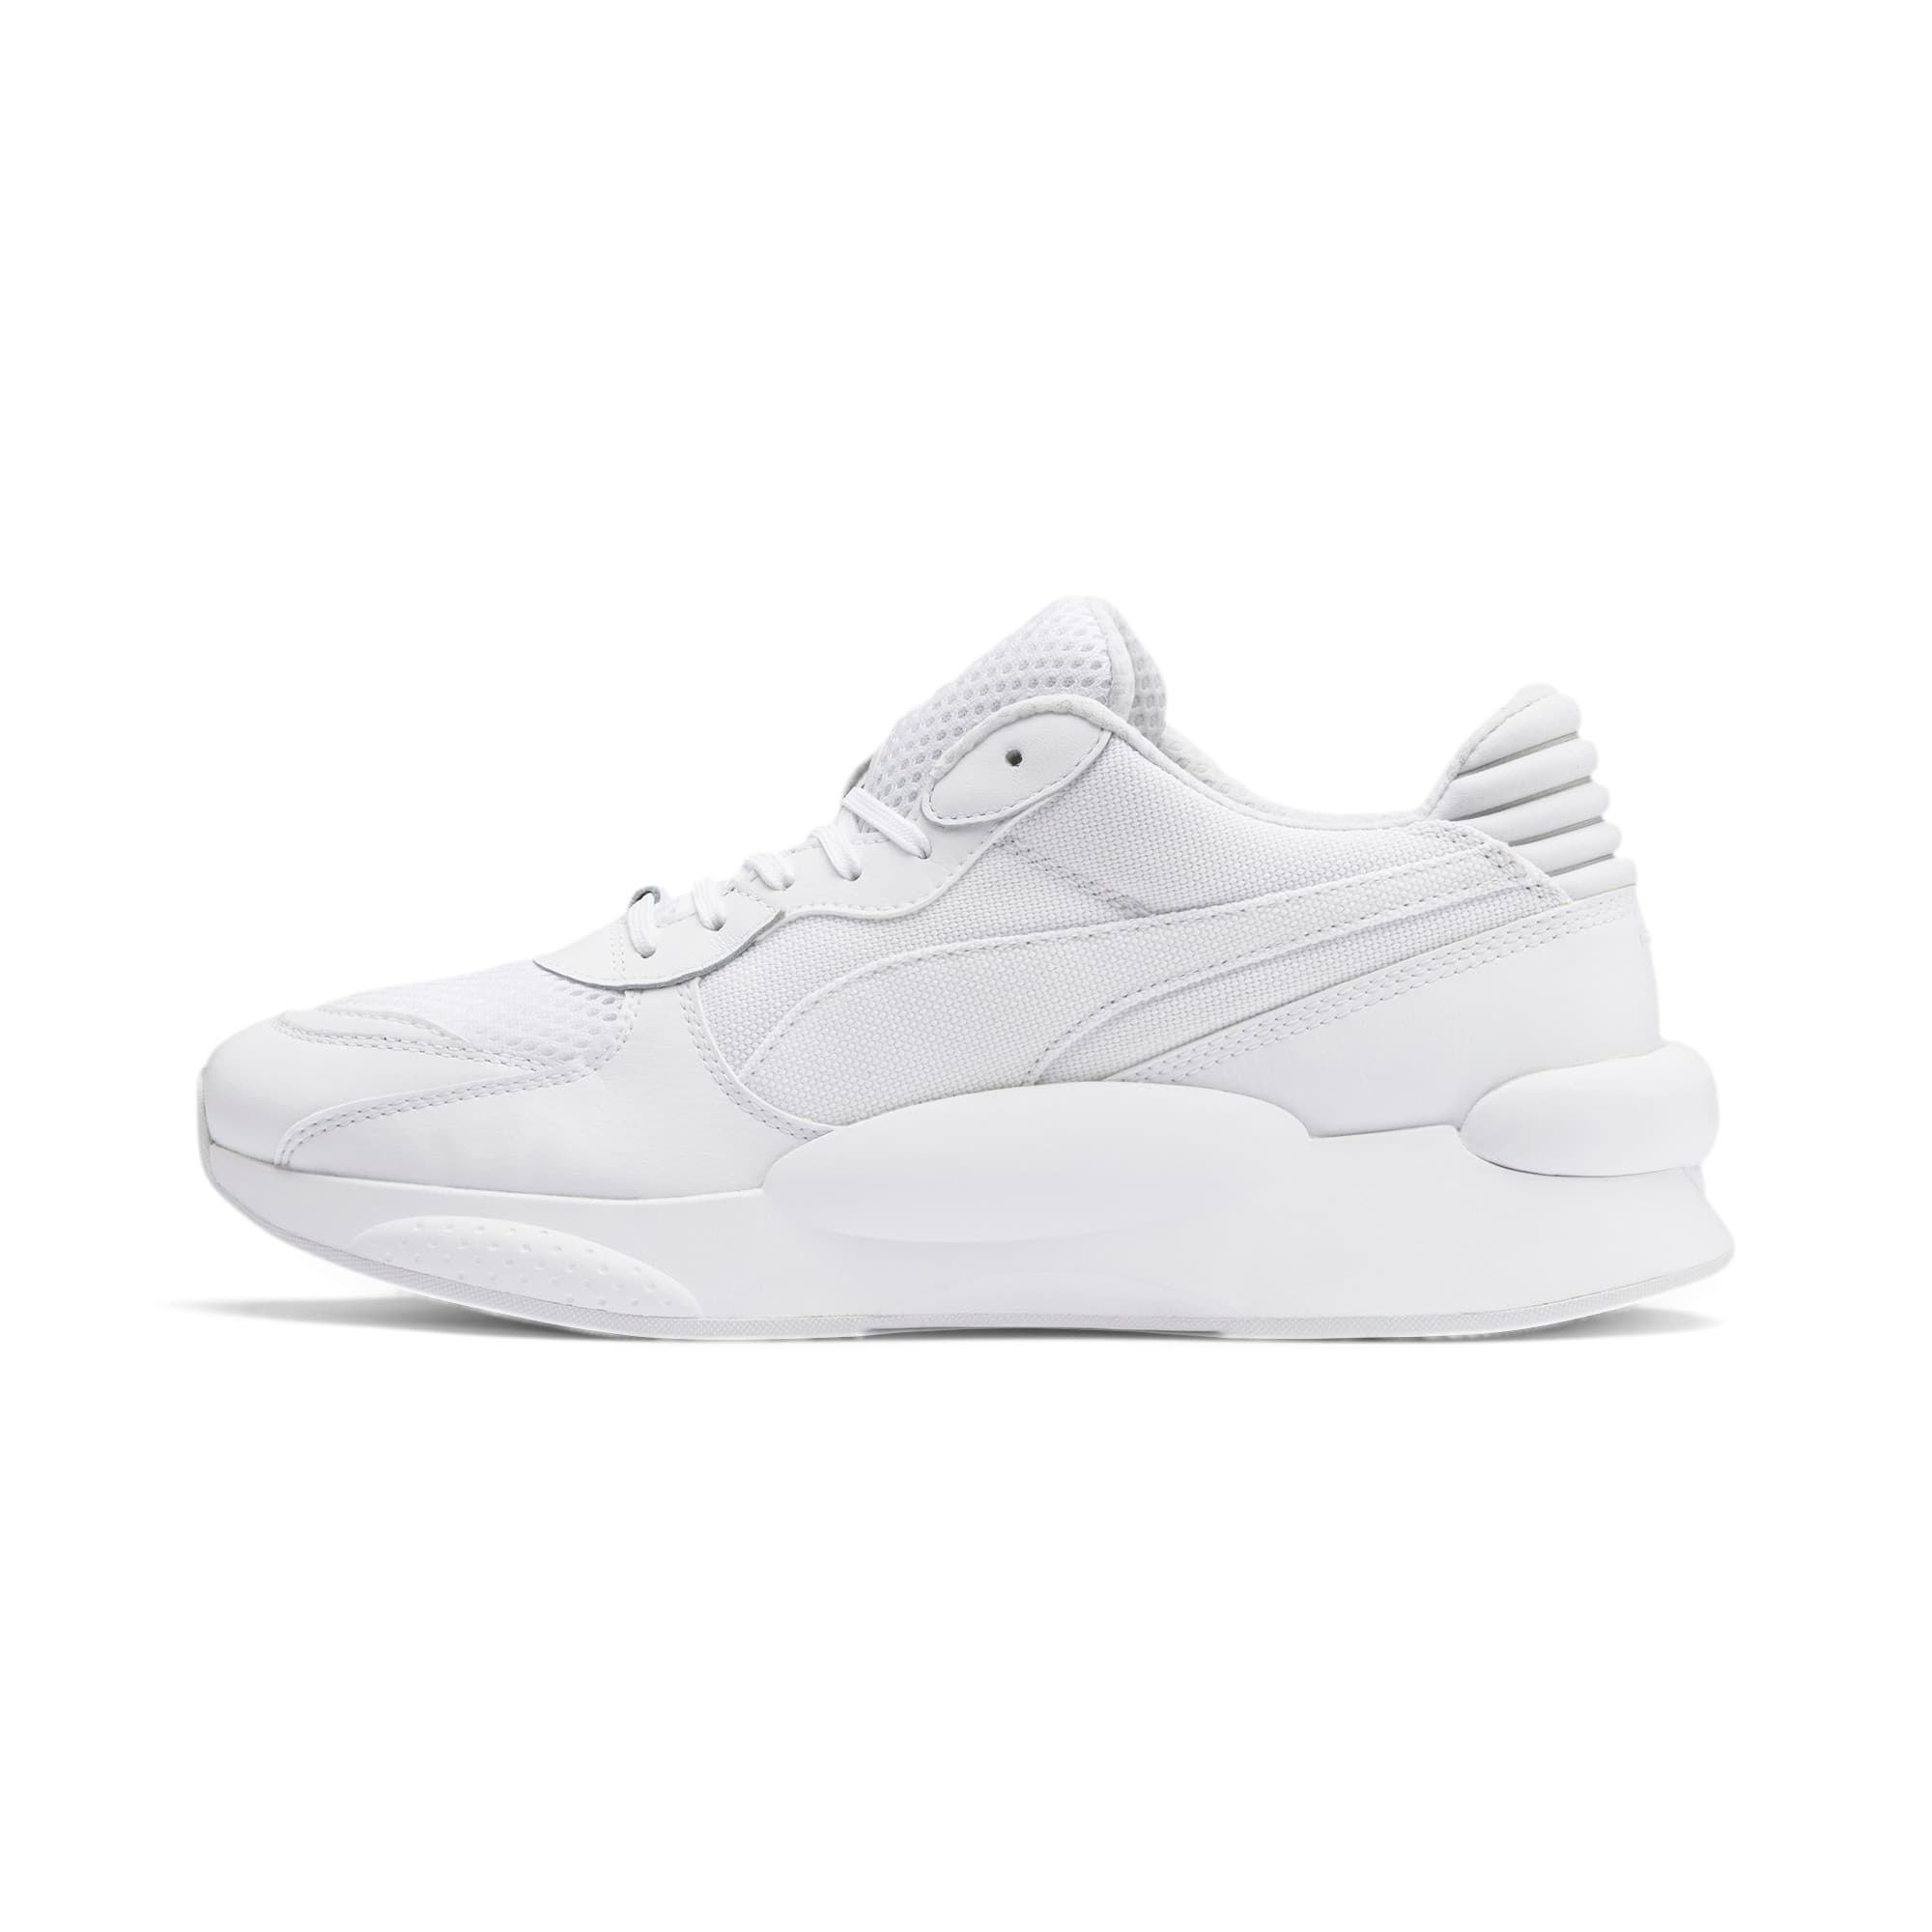 Thumbnail 1 of RS 9.8 Sneaker, Puma White, medium